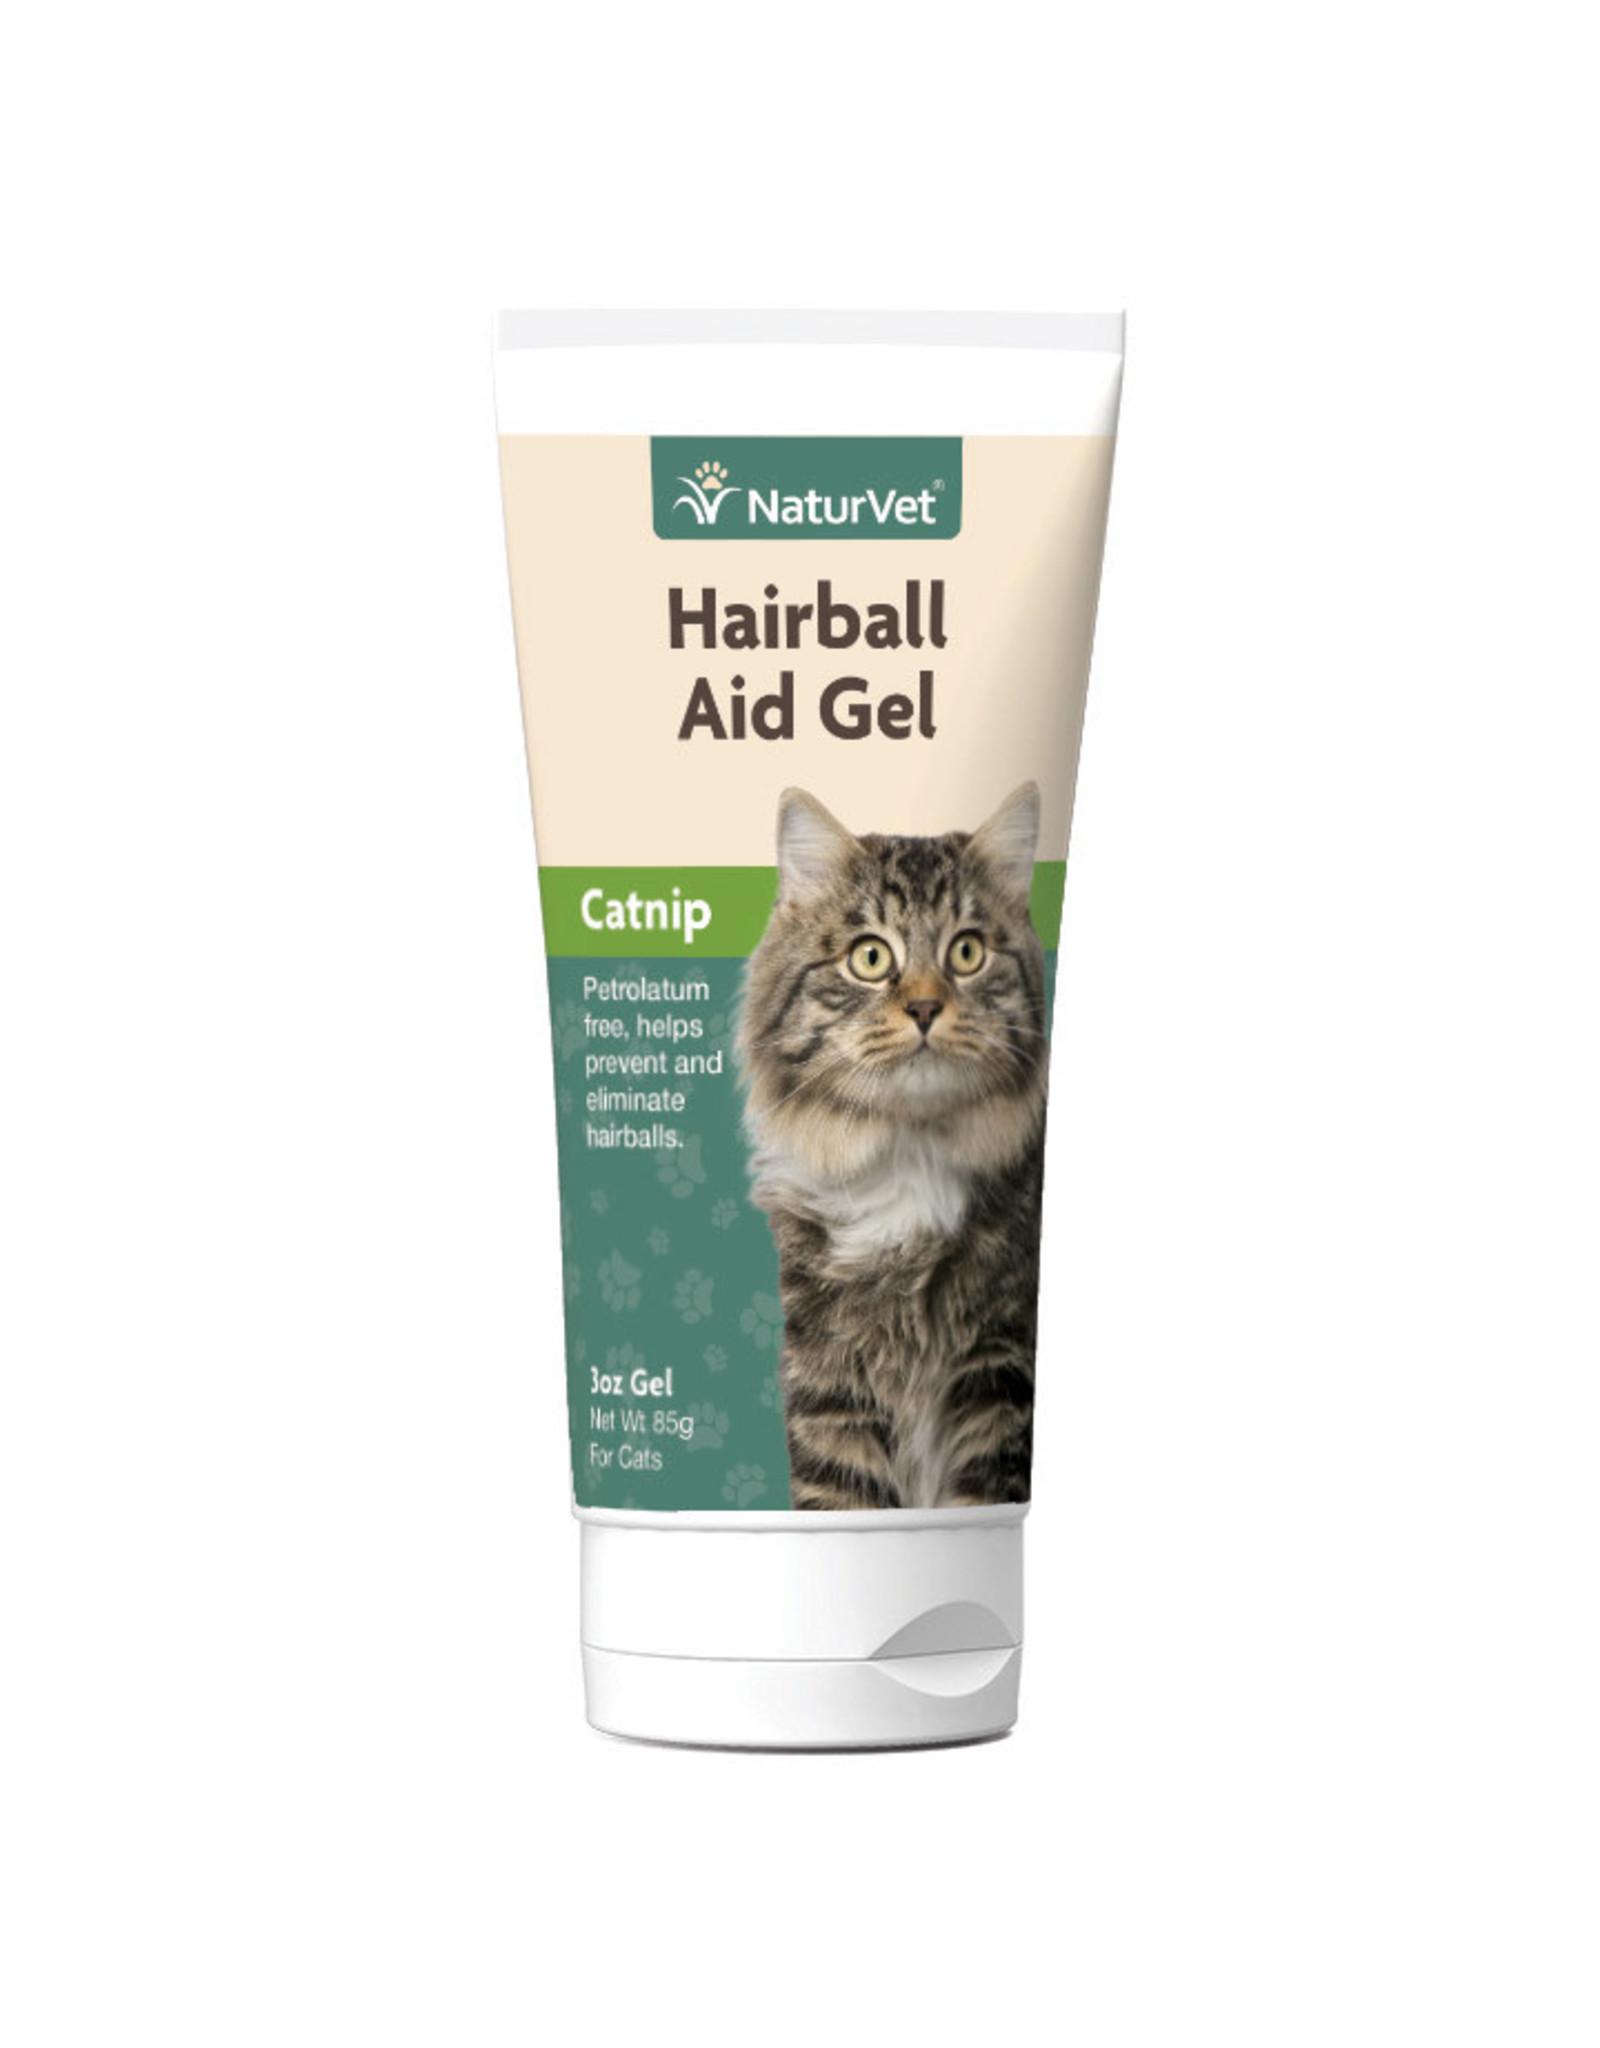 NaturVet NaturVet CAT Hairball Remedy w/Catnip Gel 3oz